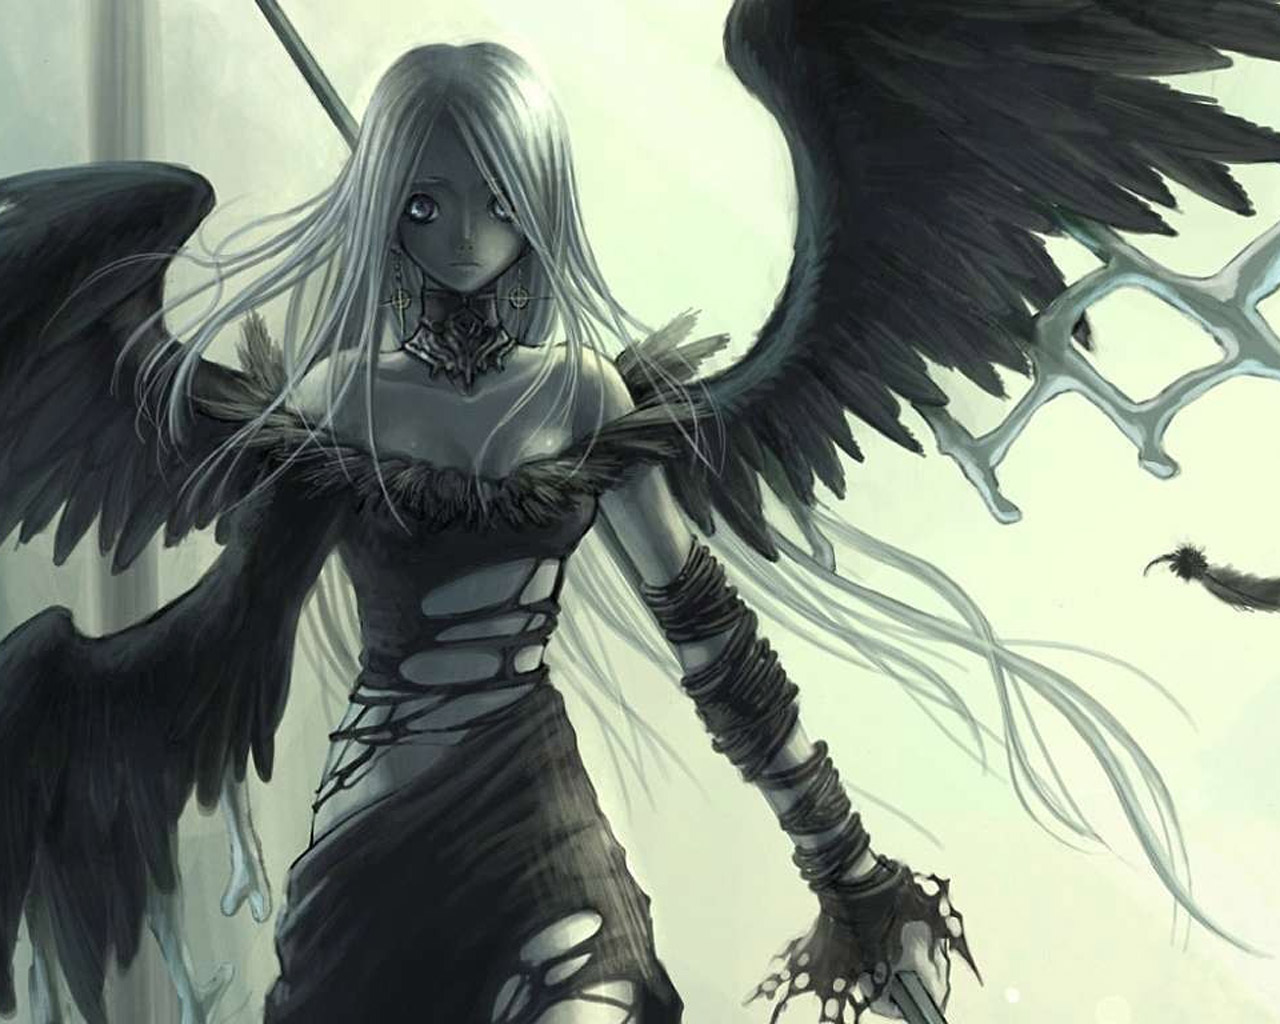 Dark wallpapers angels wallpapers - Dark angel anime wallpaper ...